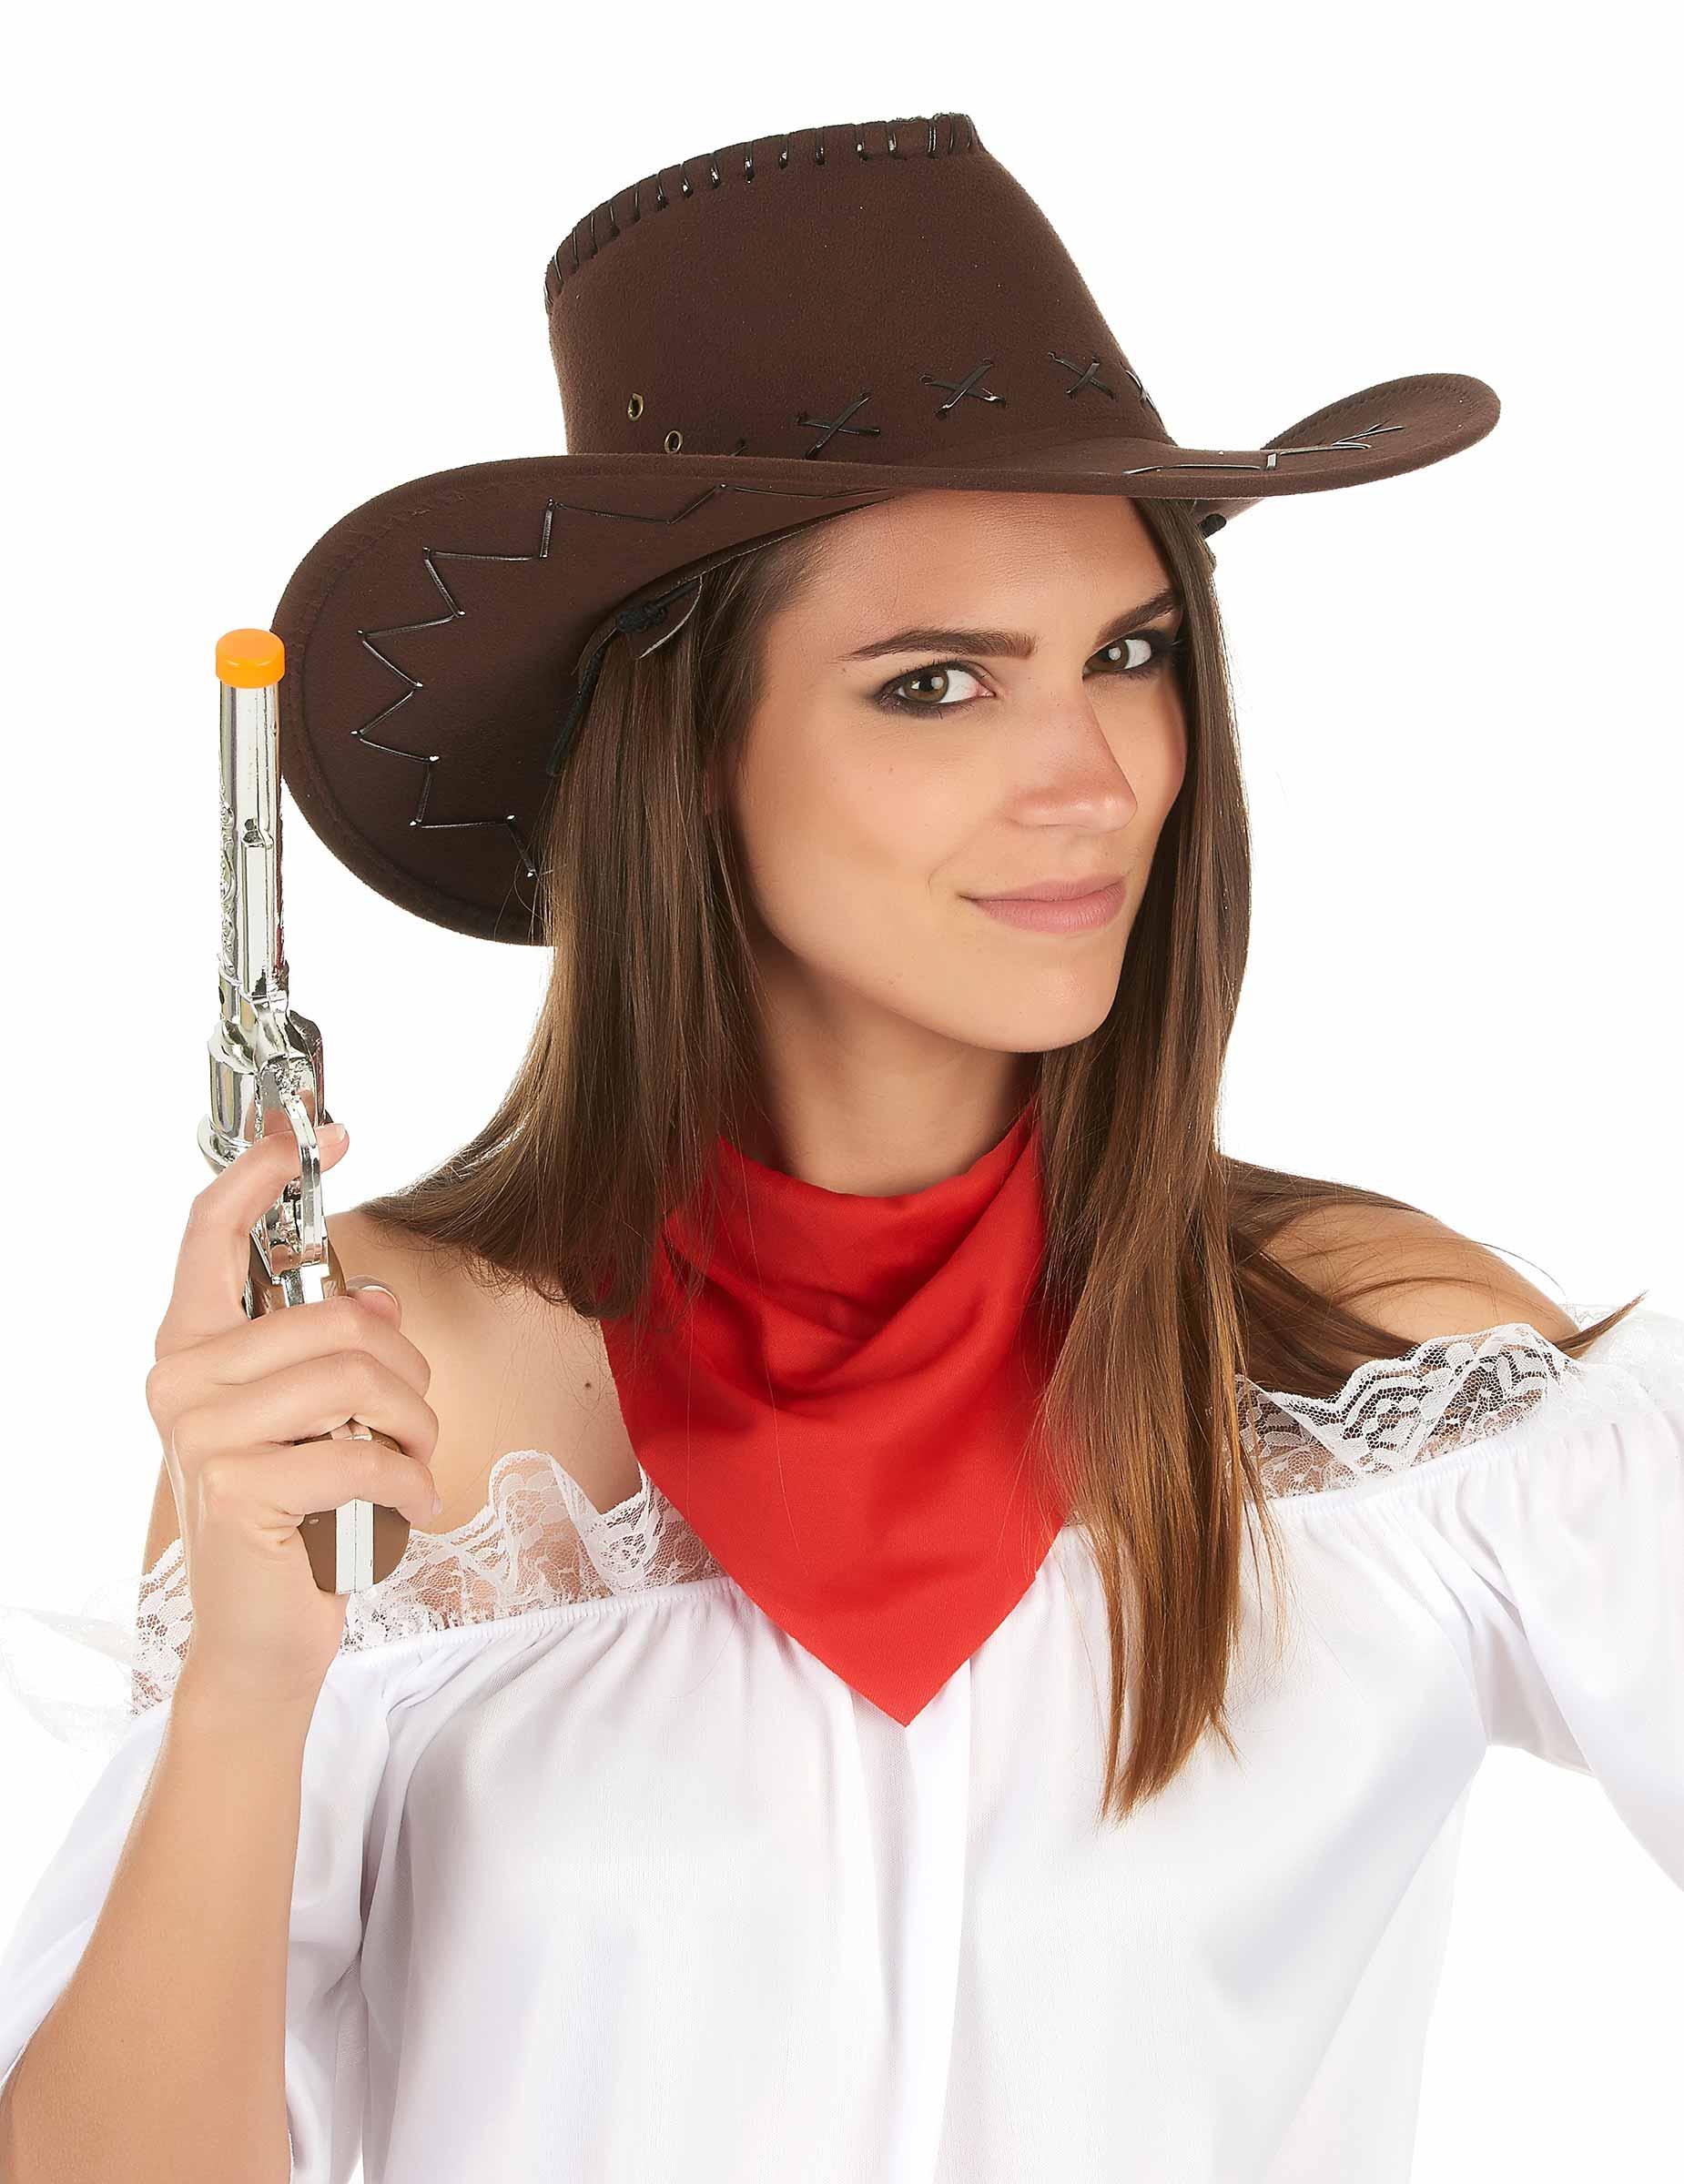 Cappello marrone da cowboy per adulto su VegaooParty fafe57caaf74